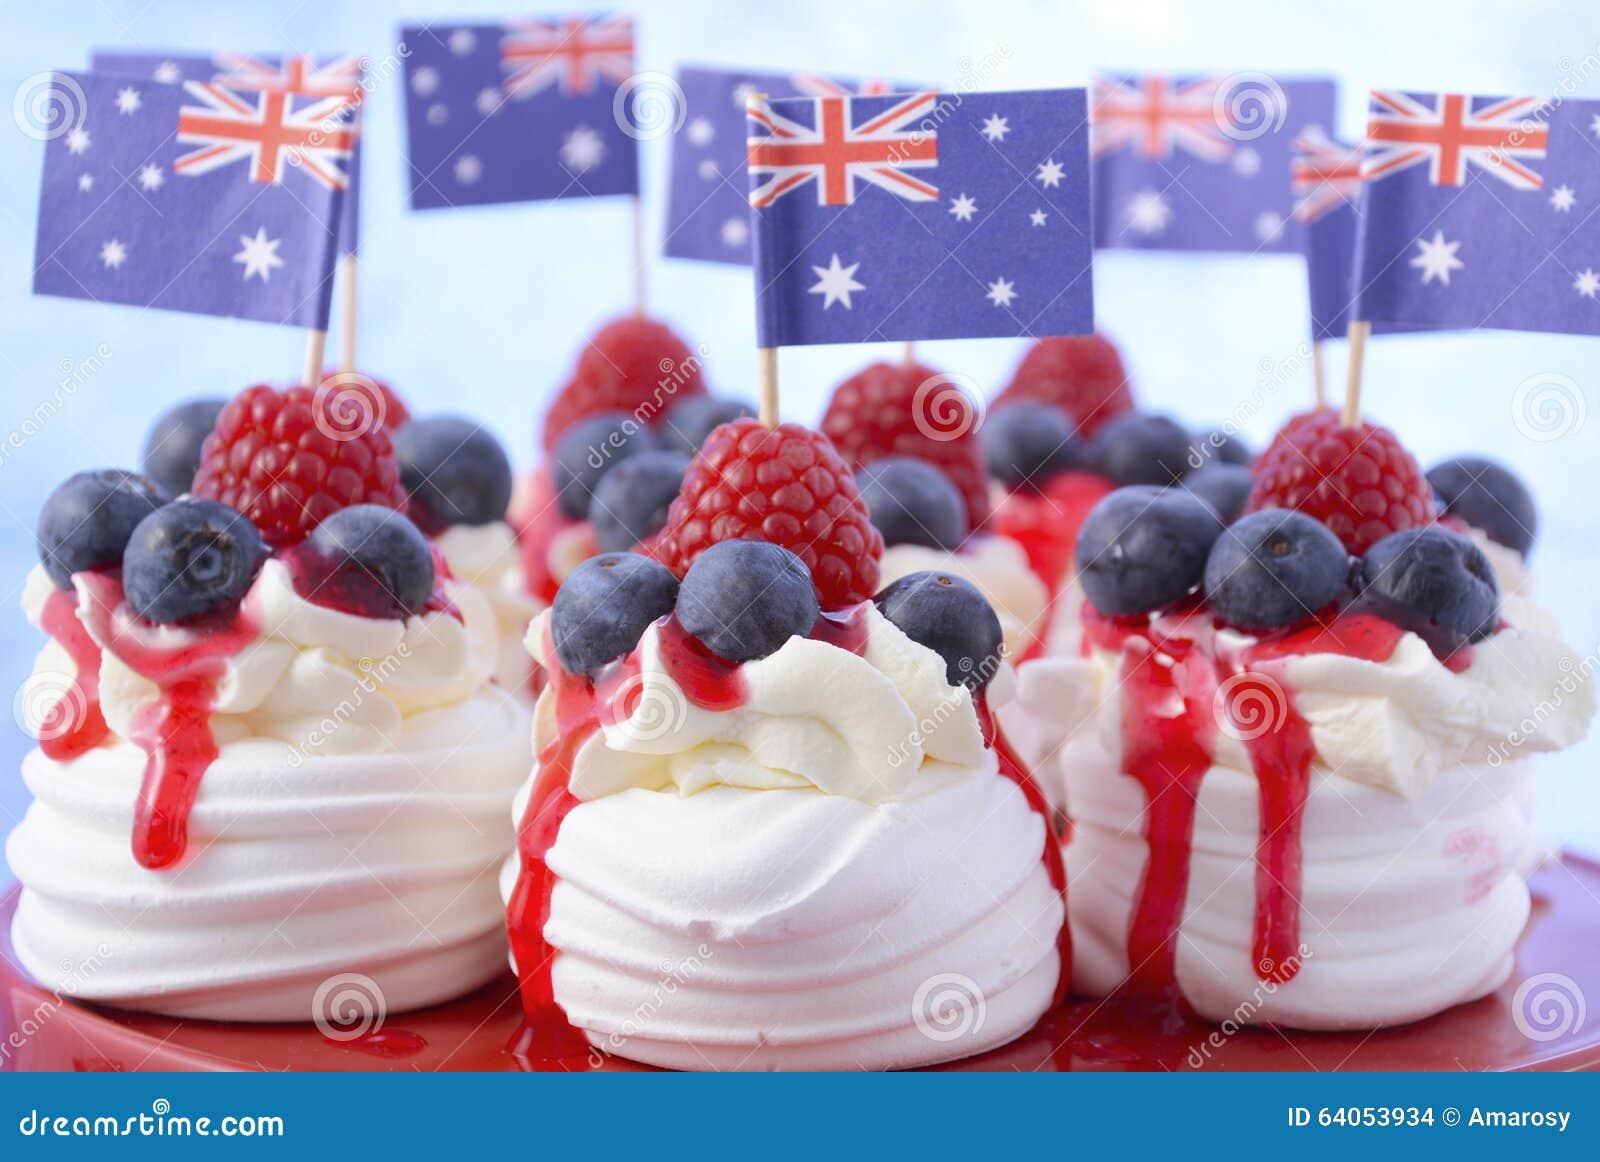 Australian mini pavlovas and flags stock photo image of for Australian food cuisine